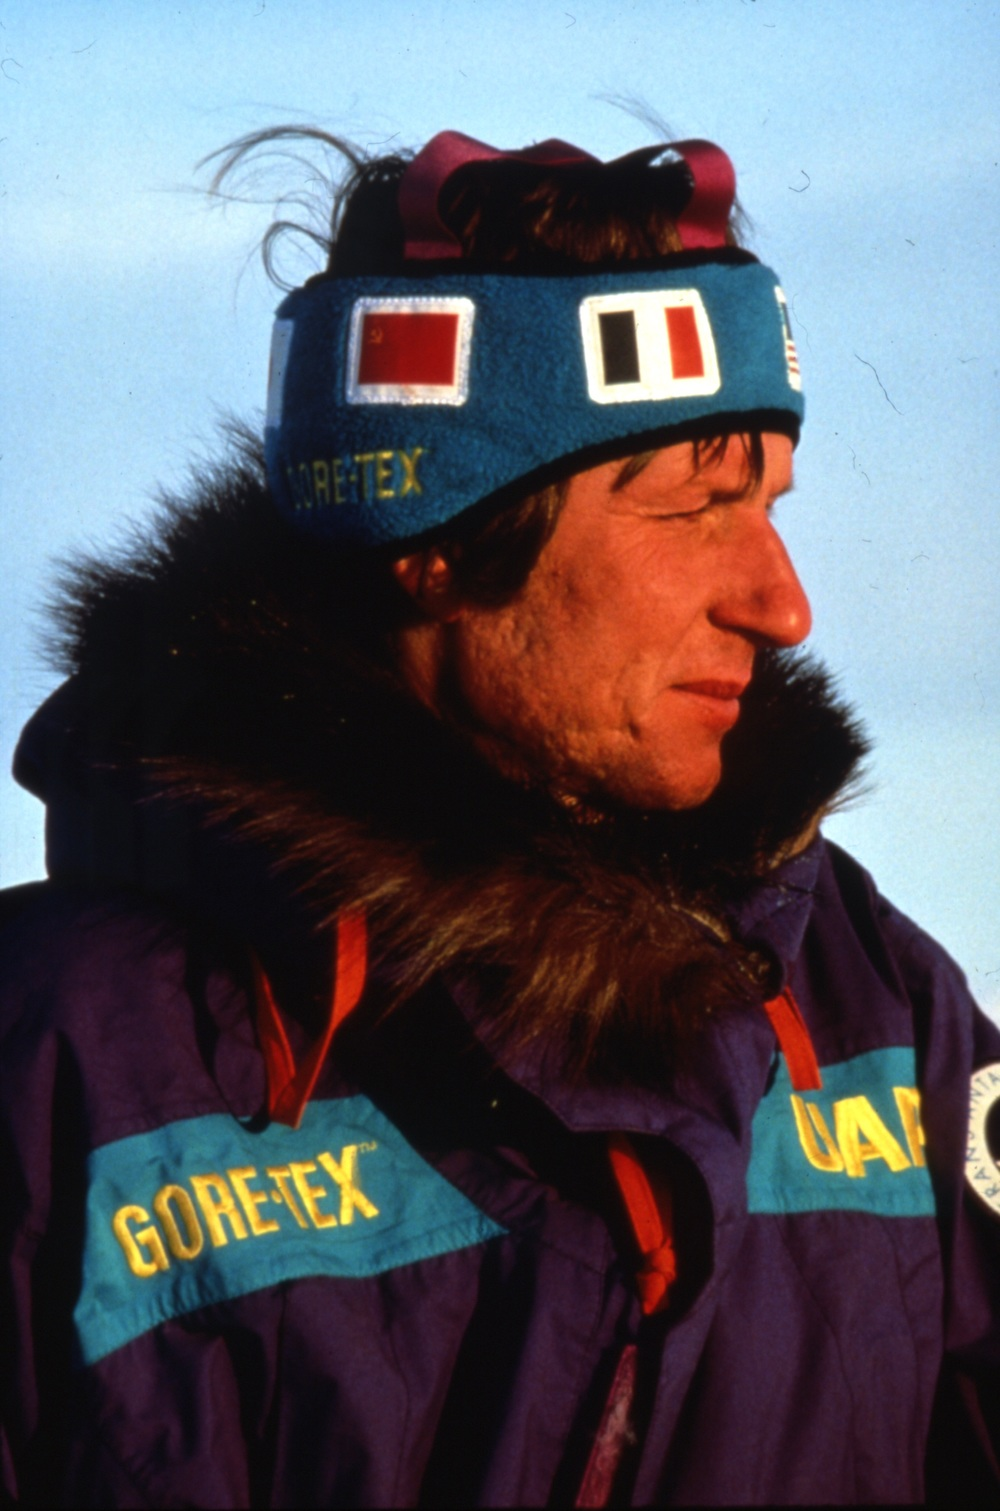 Trans-Antarctica team member Victor Boyarsky, representing the USSR. ©Trans-Antarctica, photo by Per Breiehagen